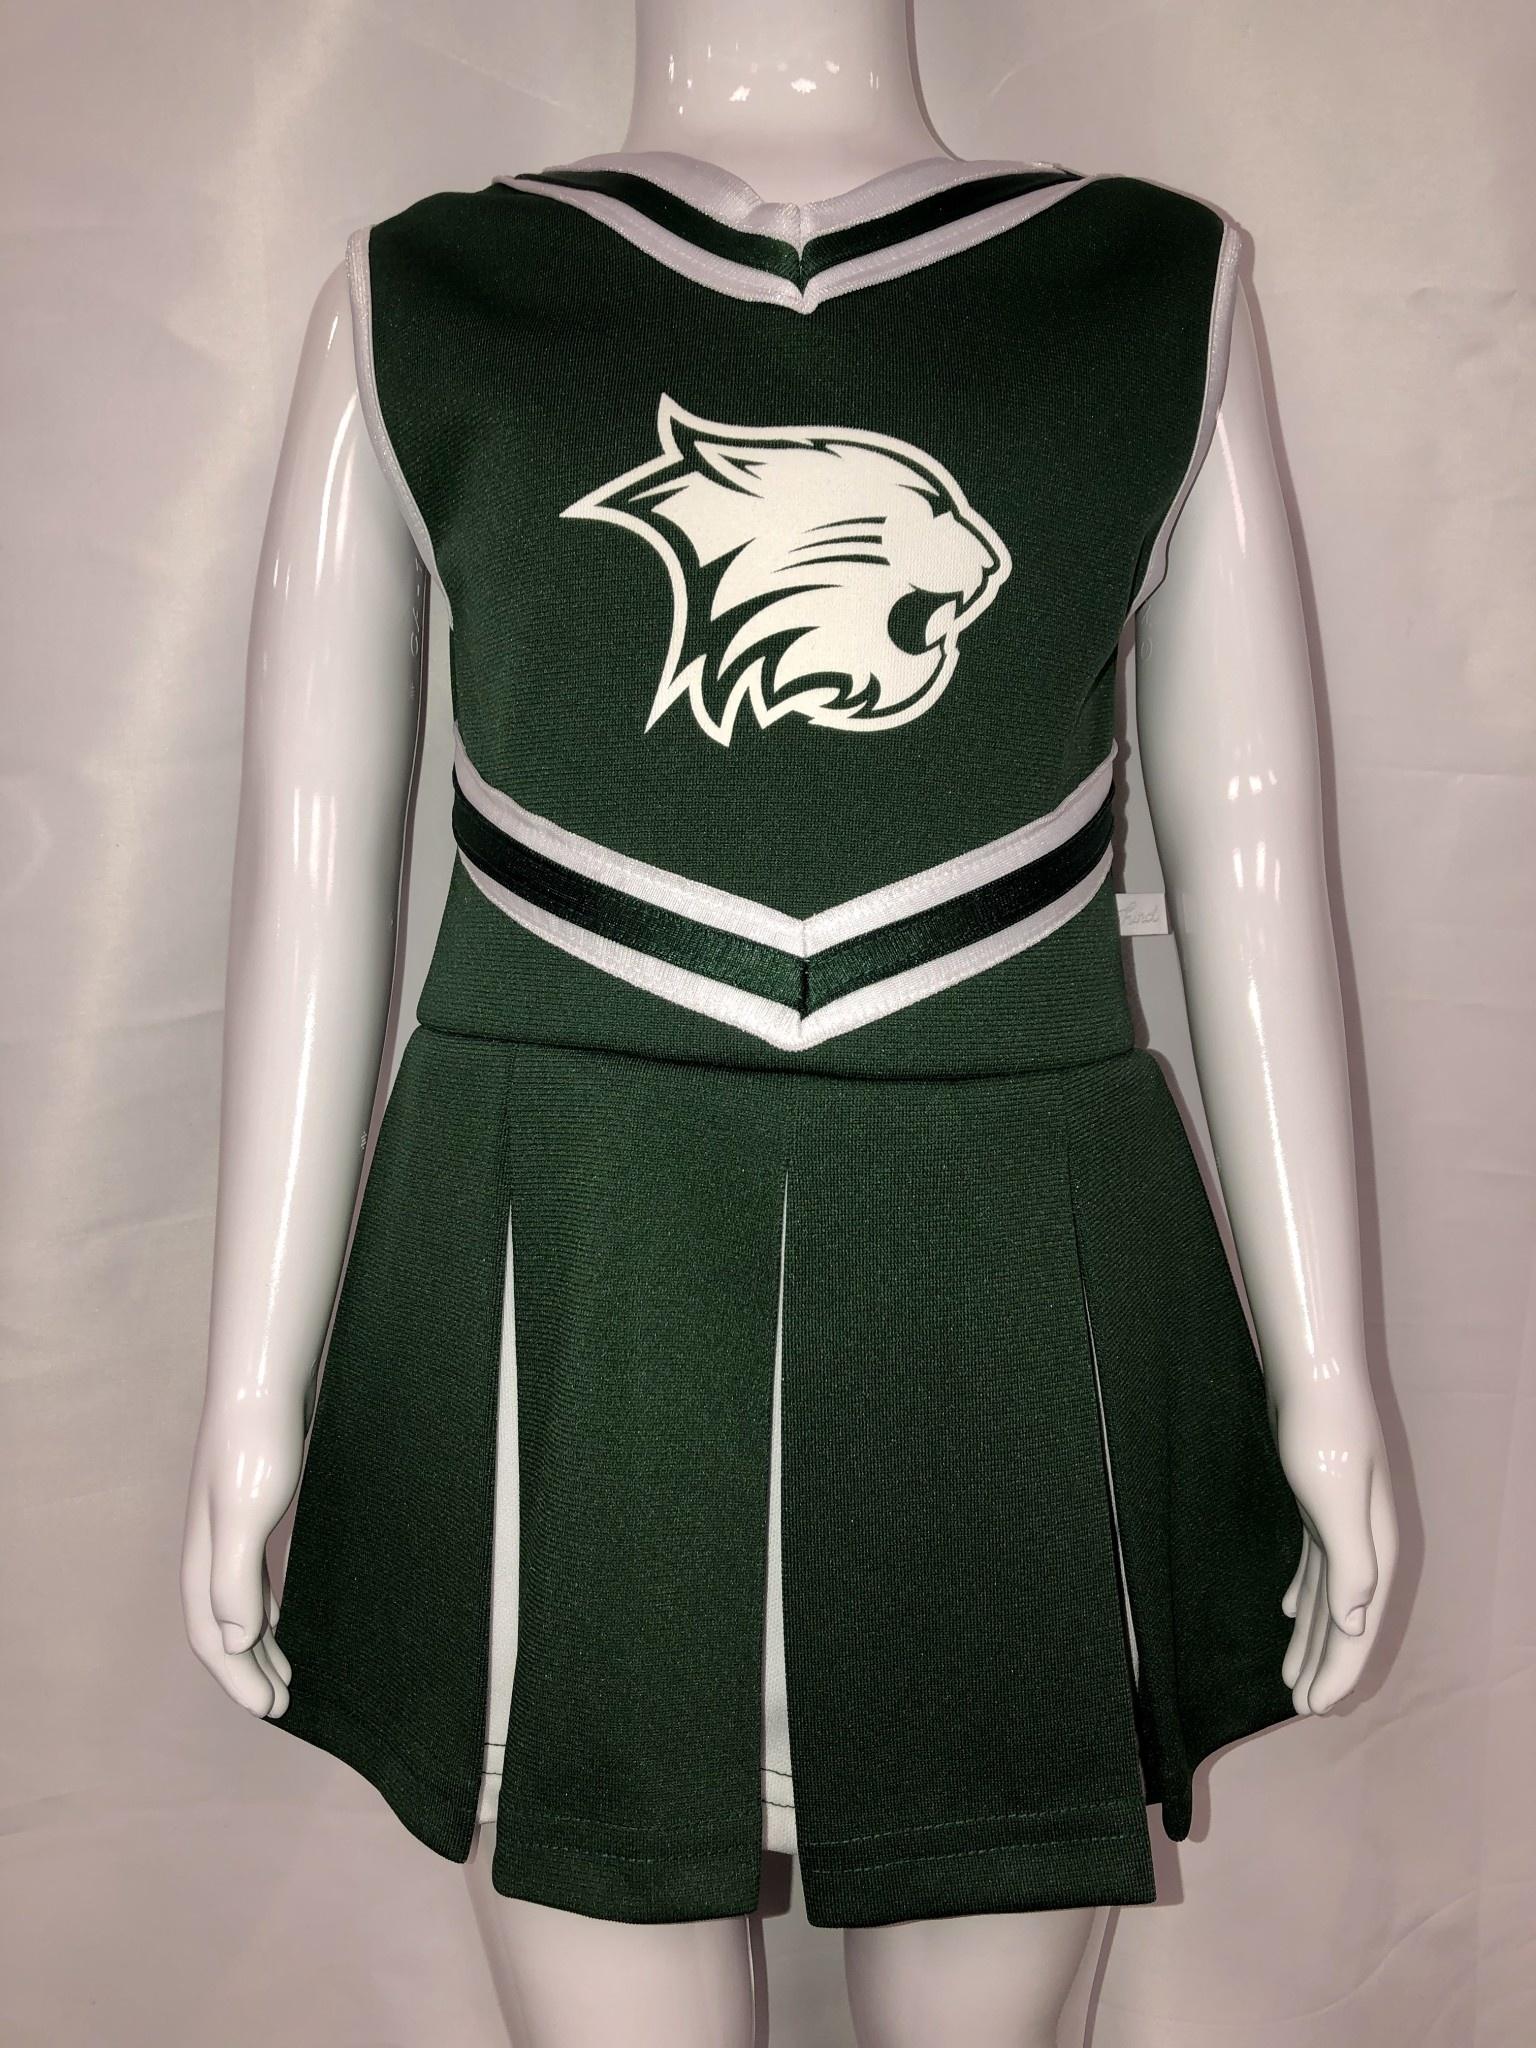 Cheerleading Dress w/ wildcat head & Bloomer panty